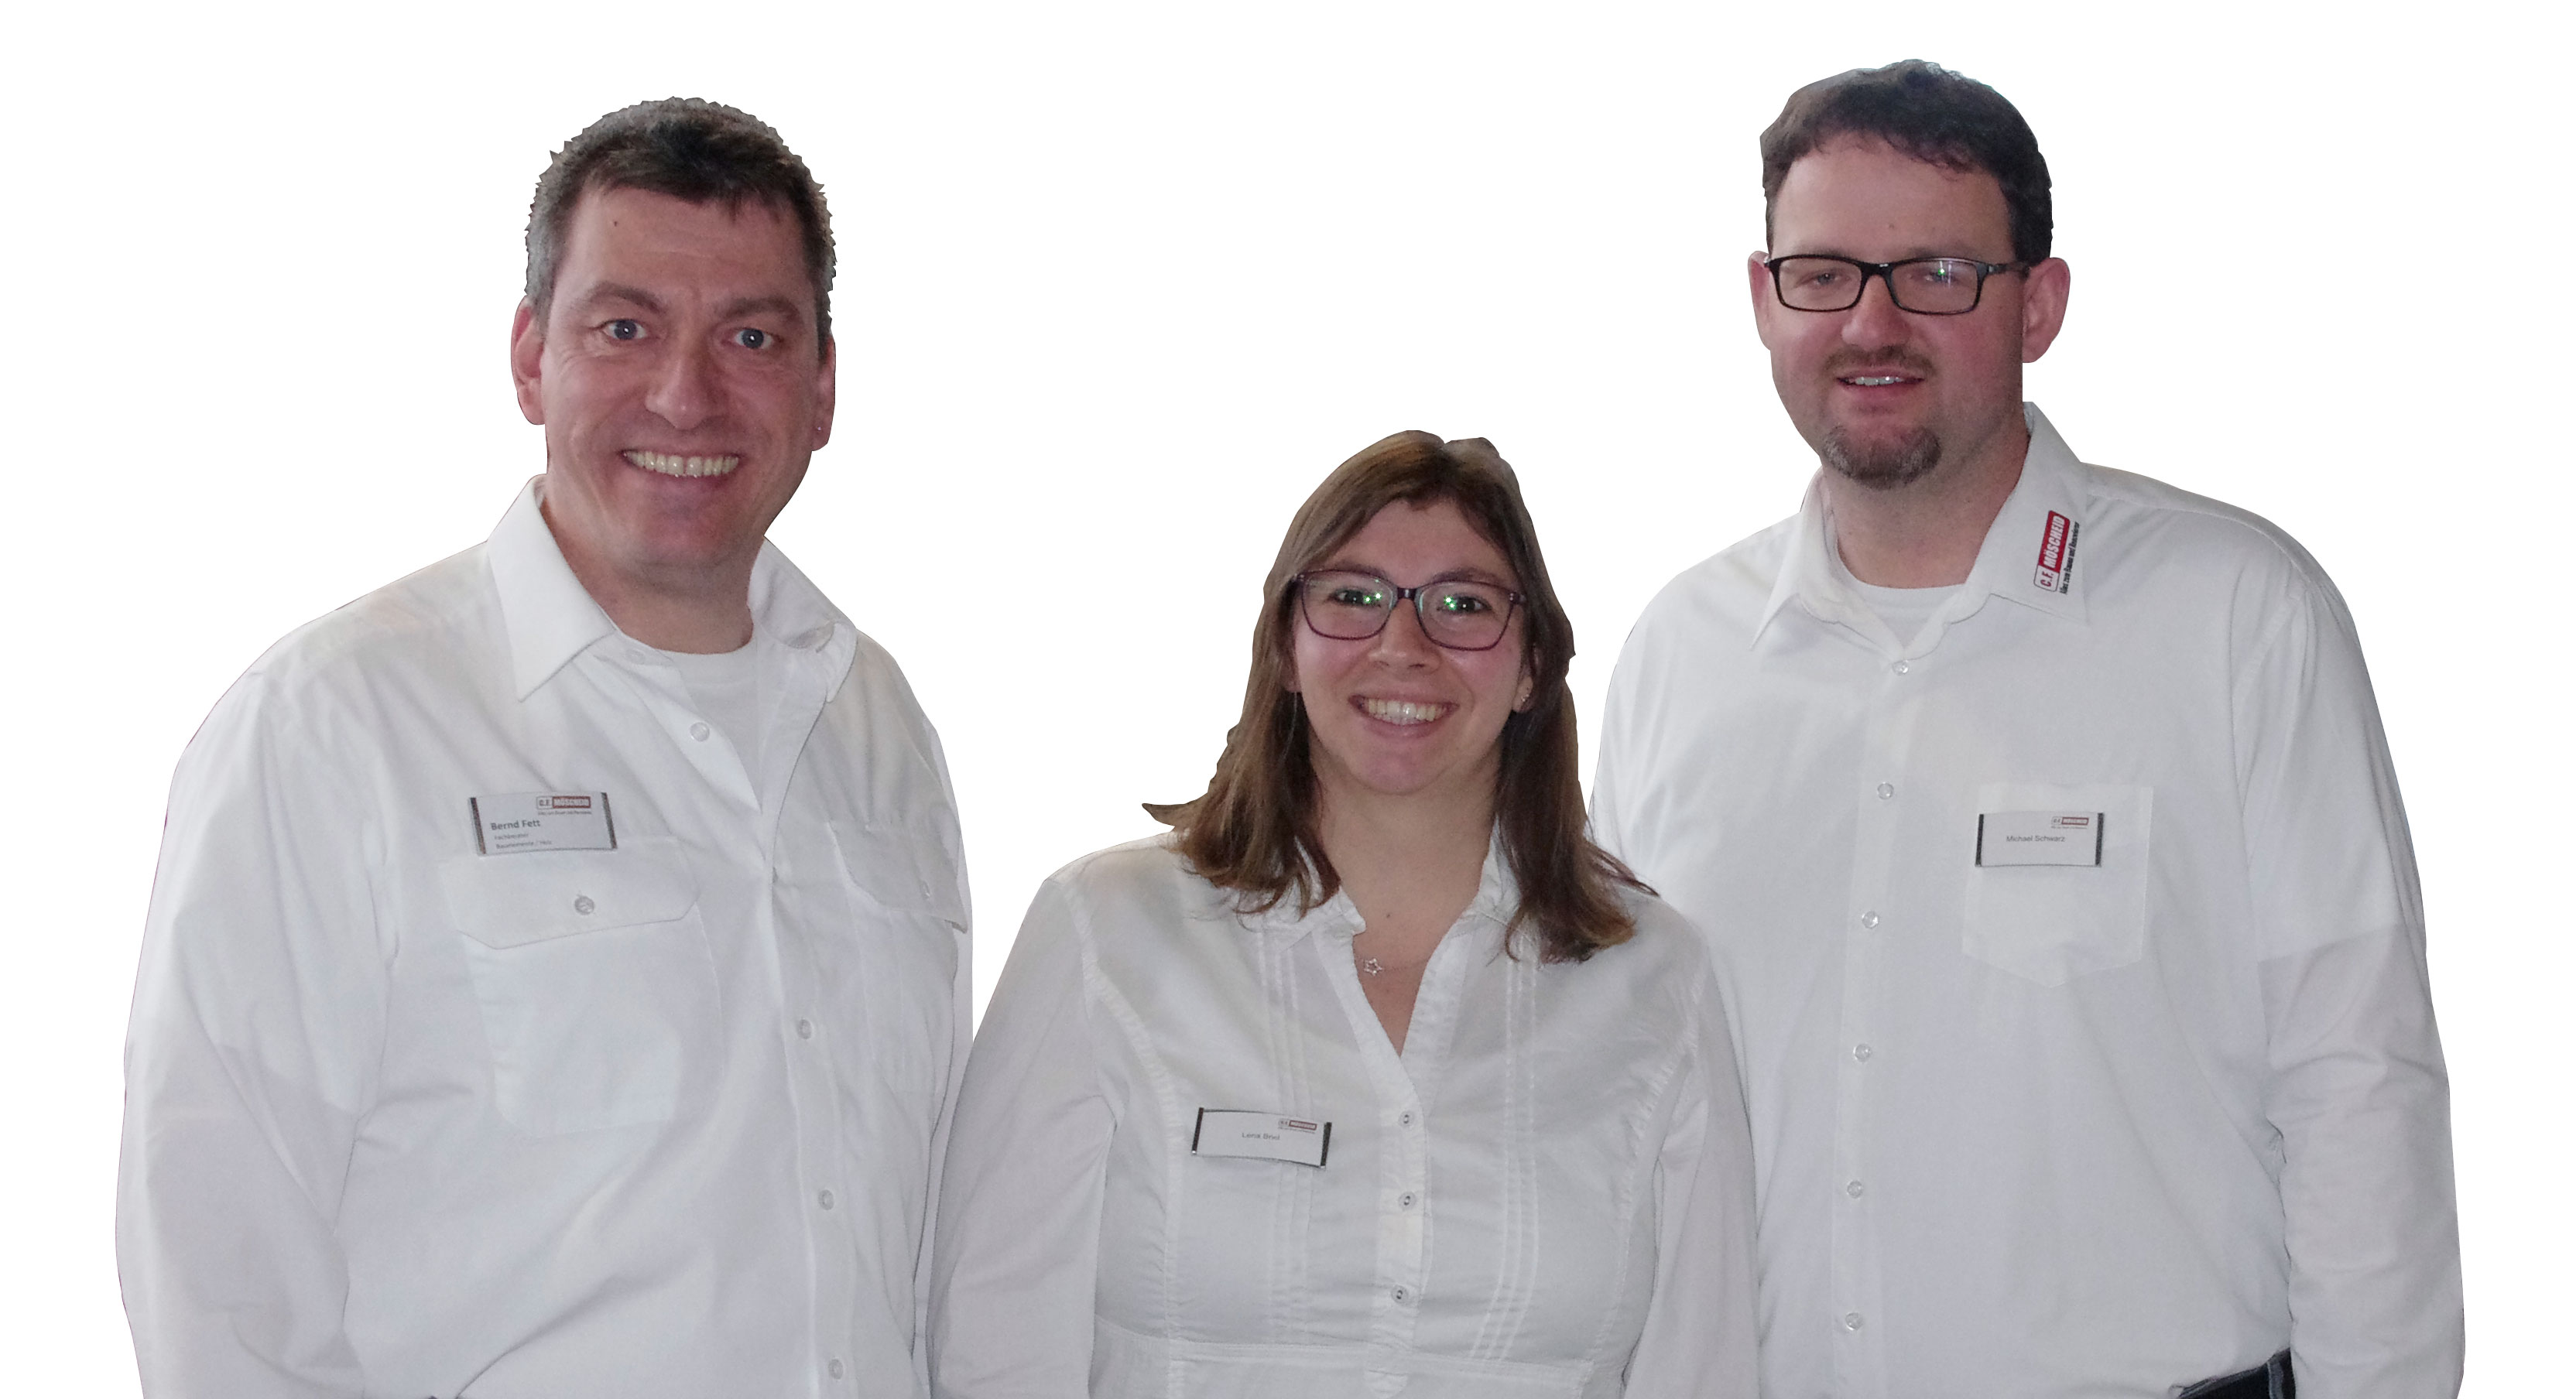 Team Frankenberg